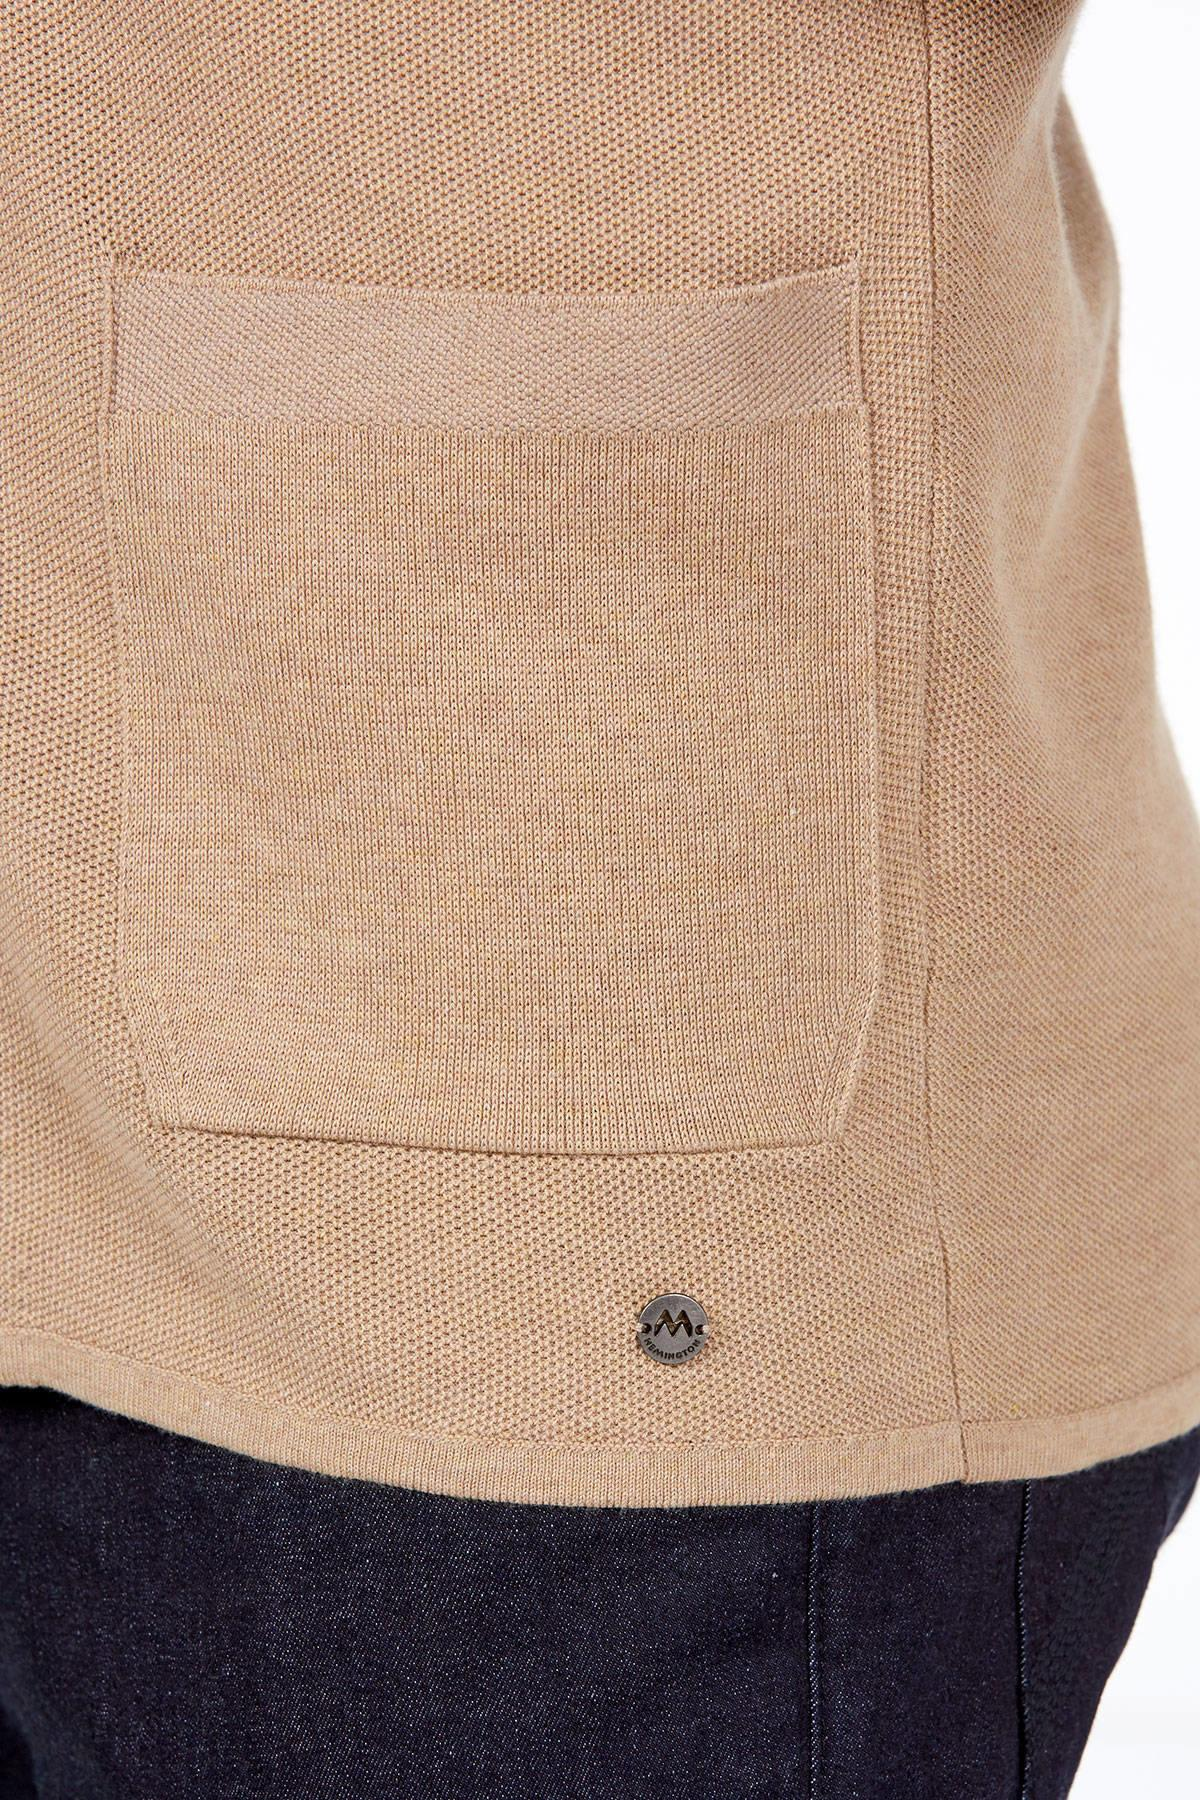 Saf Pamuk Camel Yazlık Triko Ceket